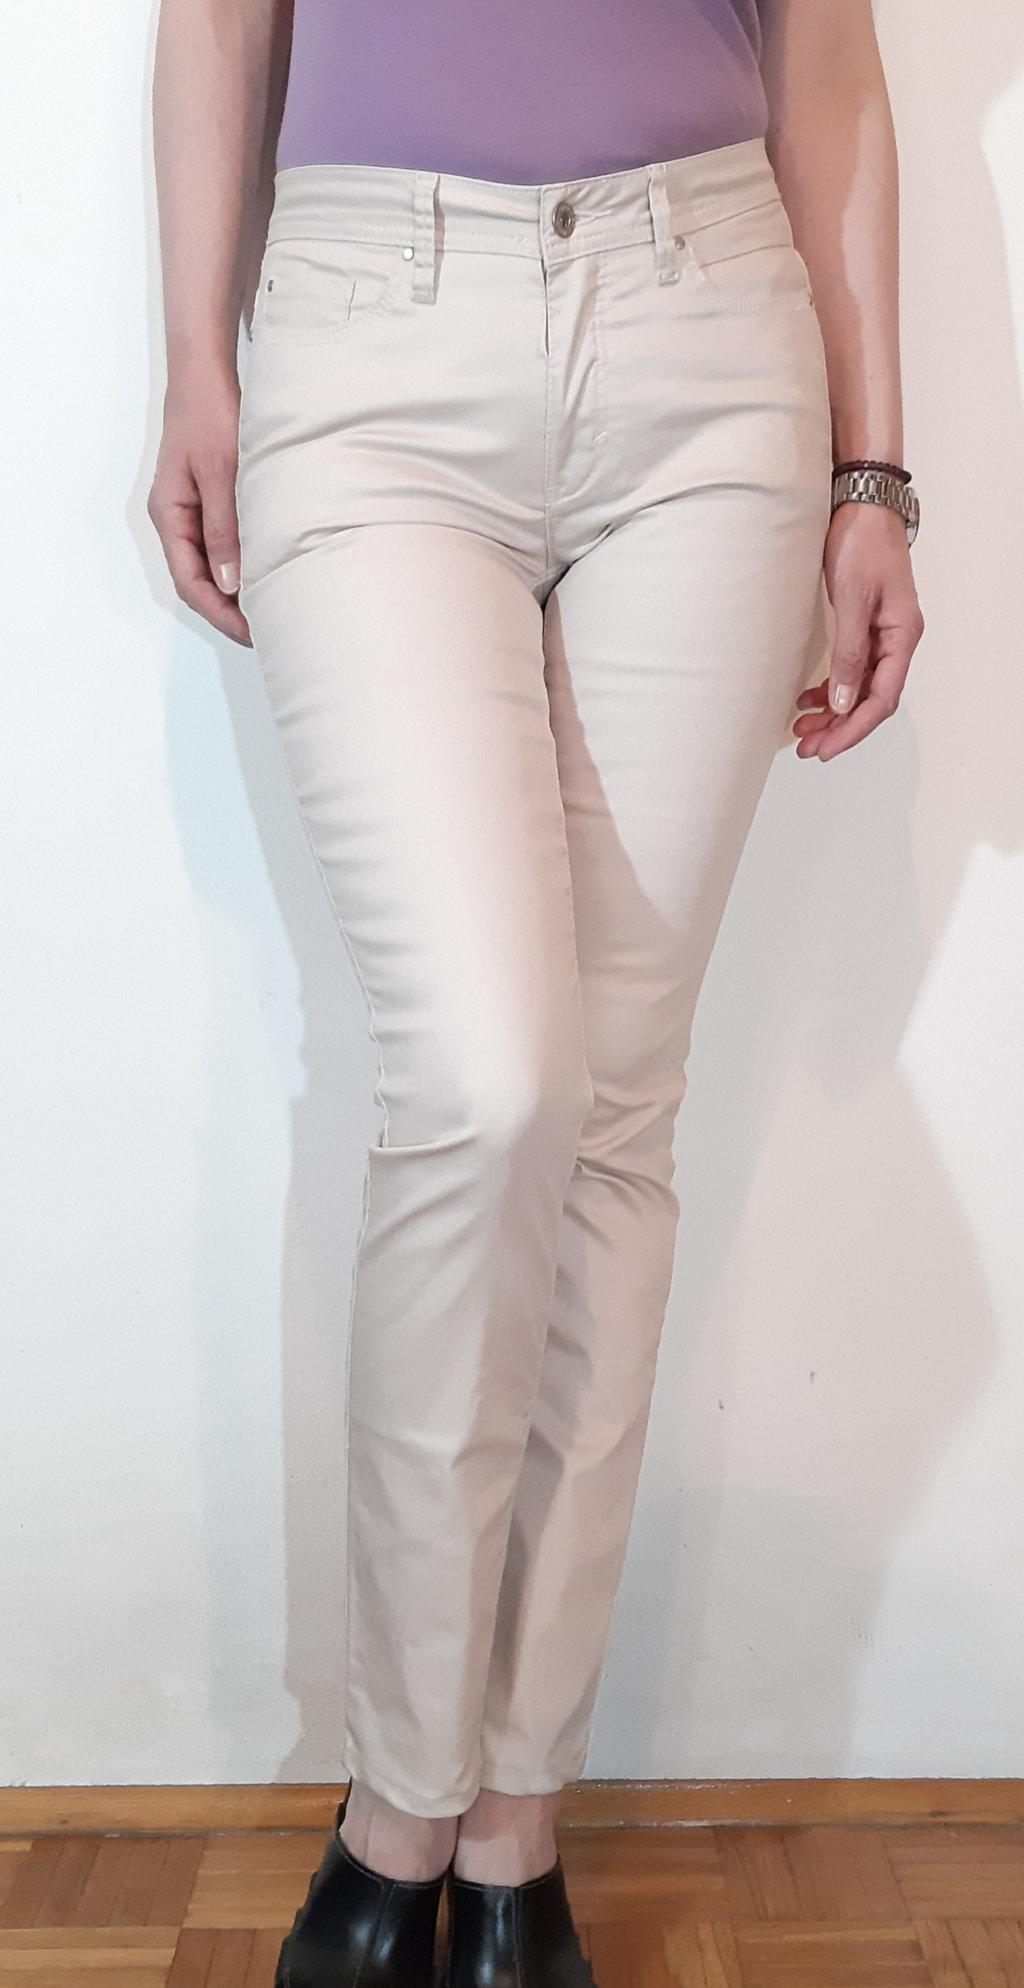 Prelepe,elegantne skinny pantalone,svetlo bebi roze boje,gotovo bez od materijala nalik eko kozi sa malo elastina